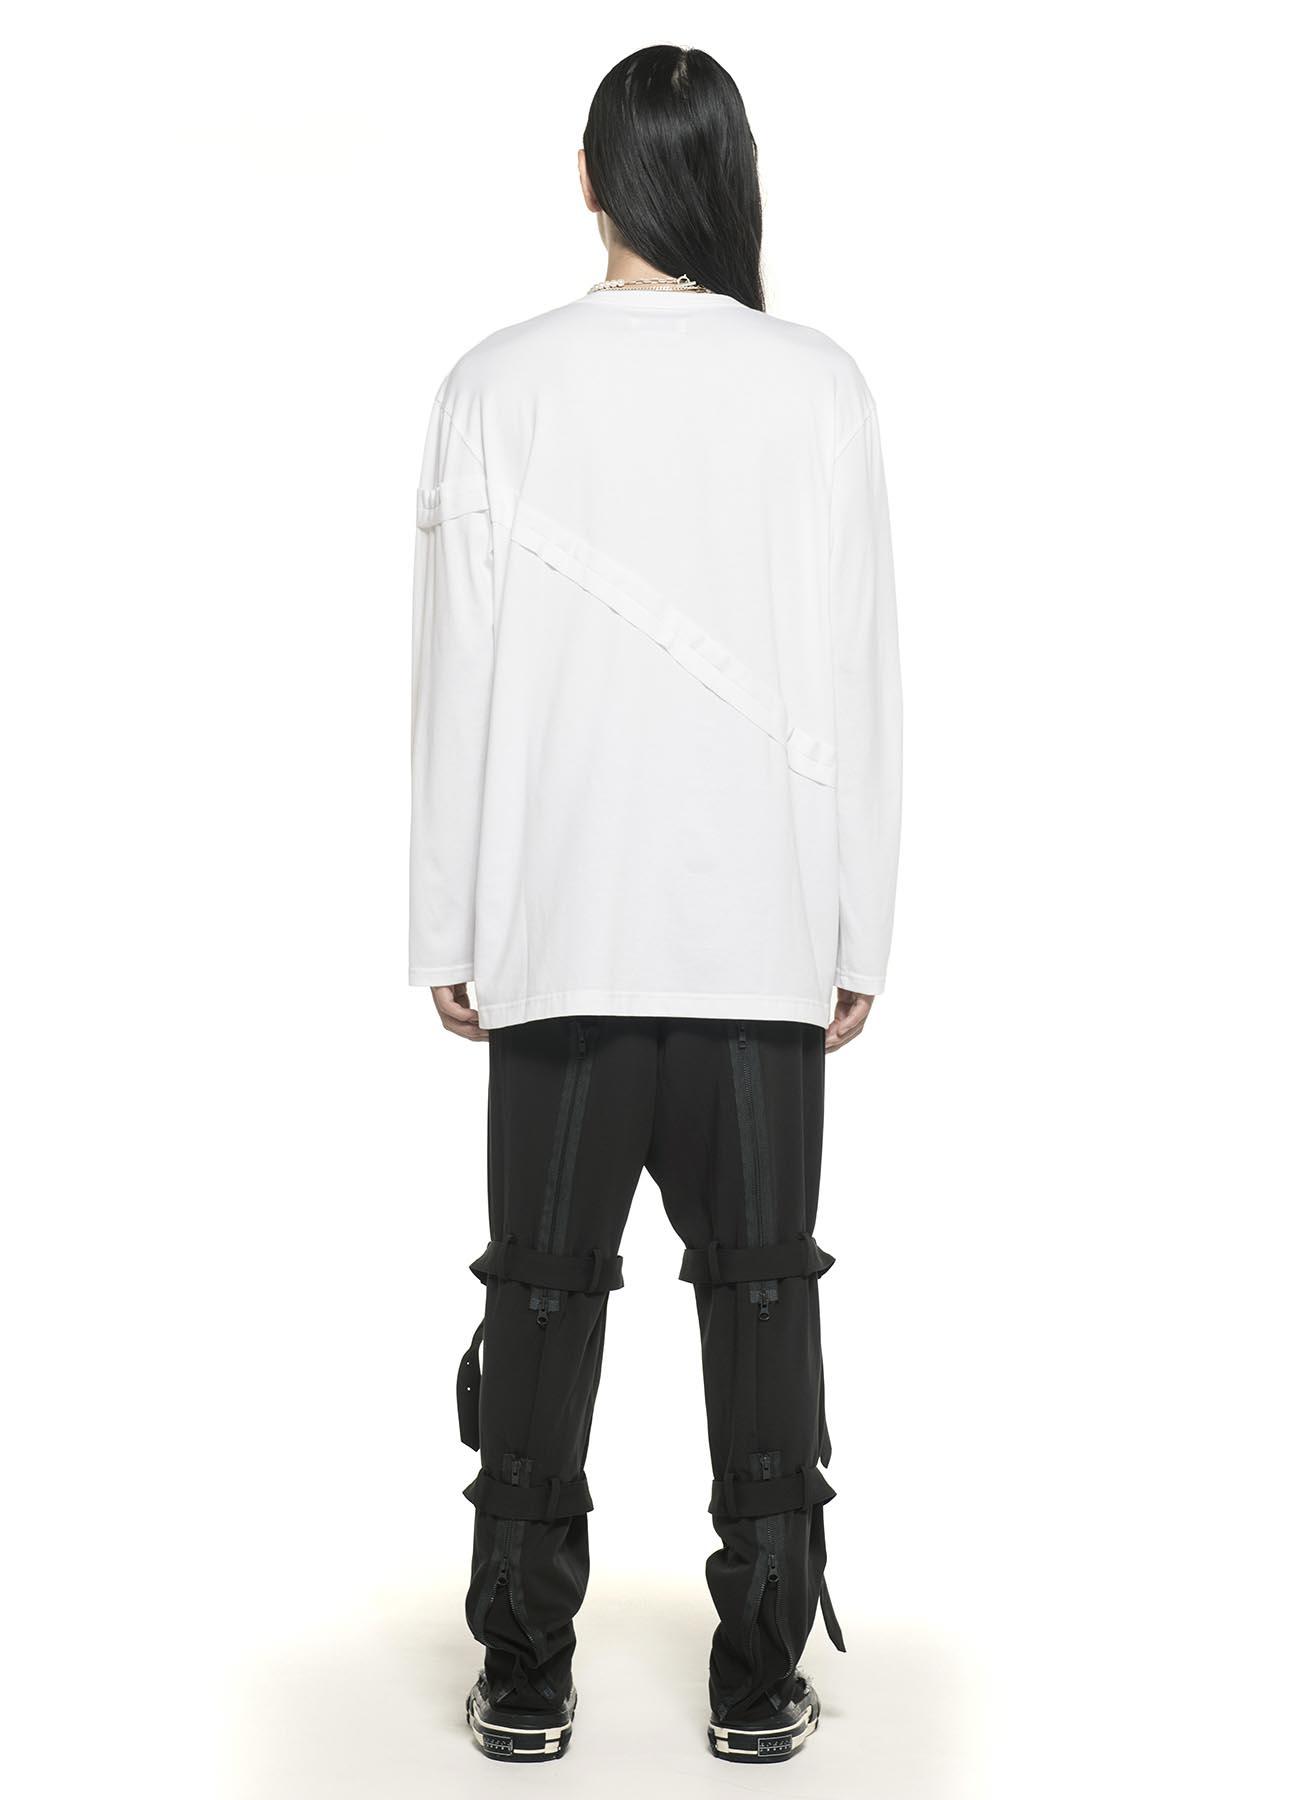 40/2 Jersey Diagonal Inside out Pocket T-shirt